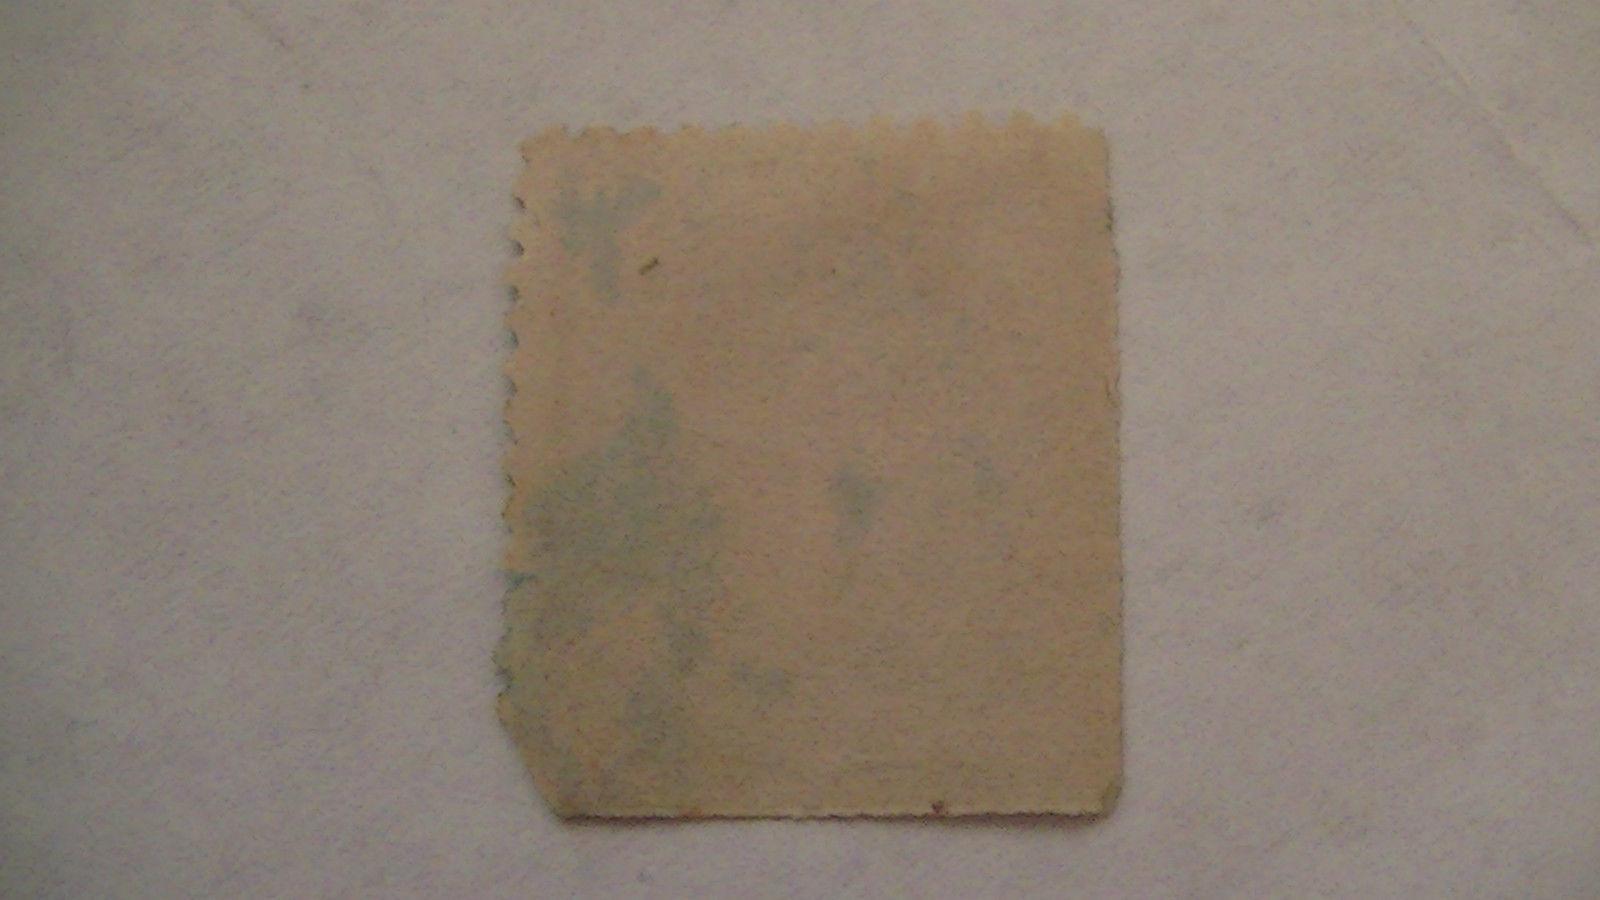 Rose Vintage USA Used 2 Cent Stamp Cancelled